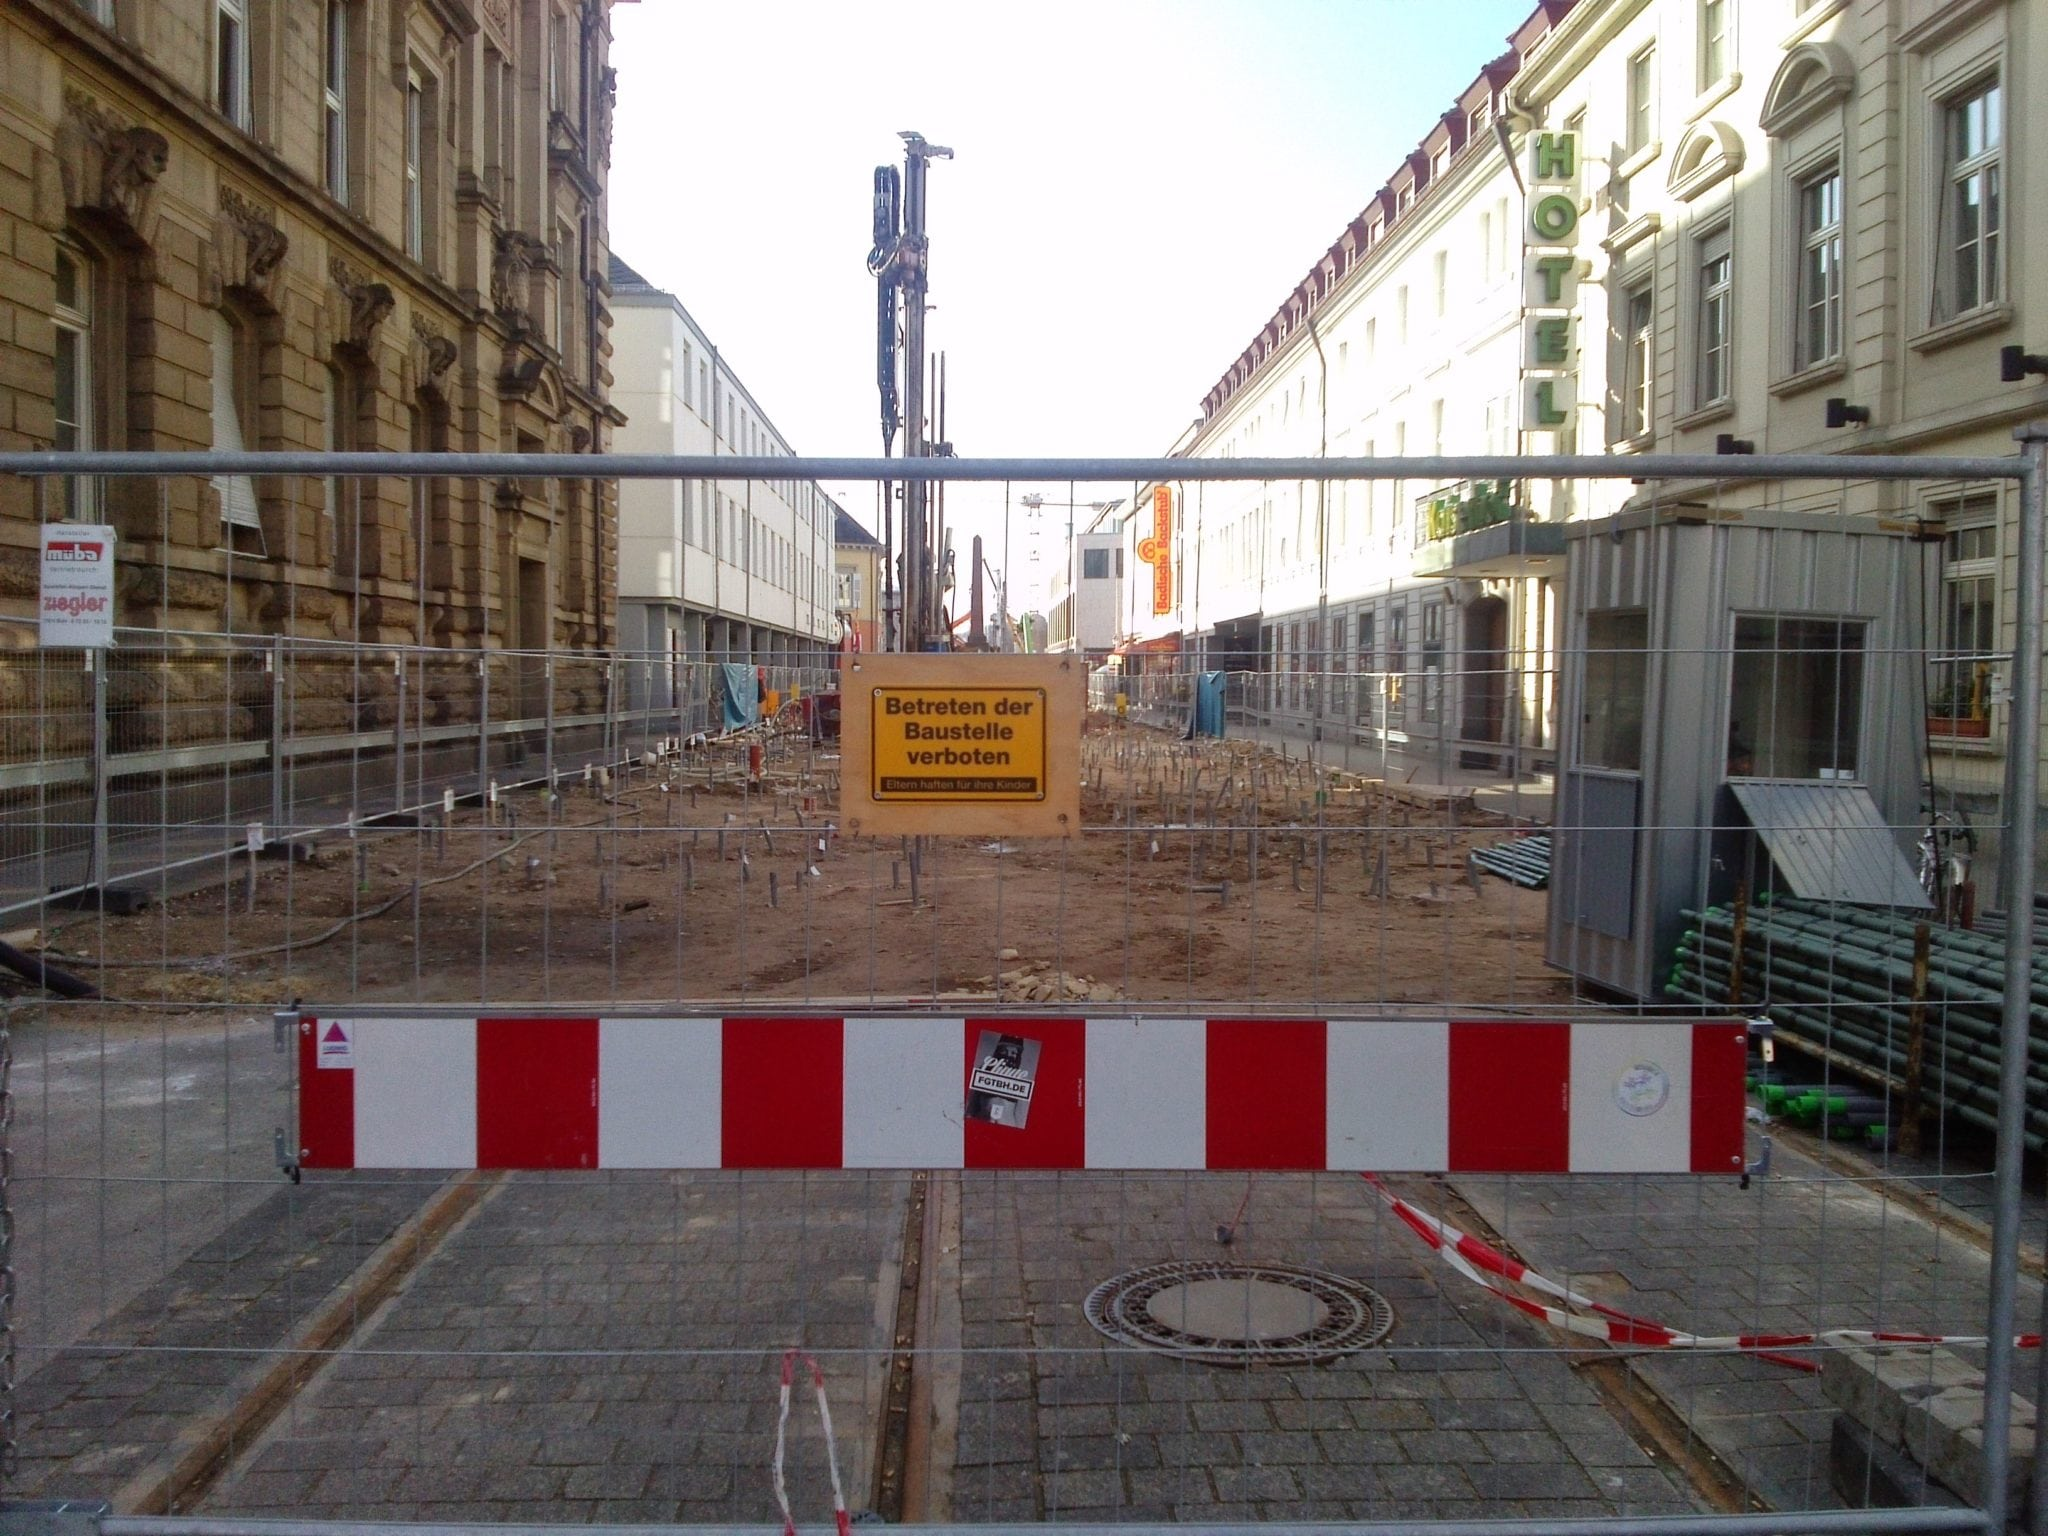 Fragwürdige Koordination der Straßenbaustellen in Karlsruhe